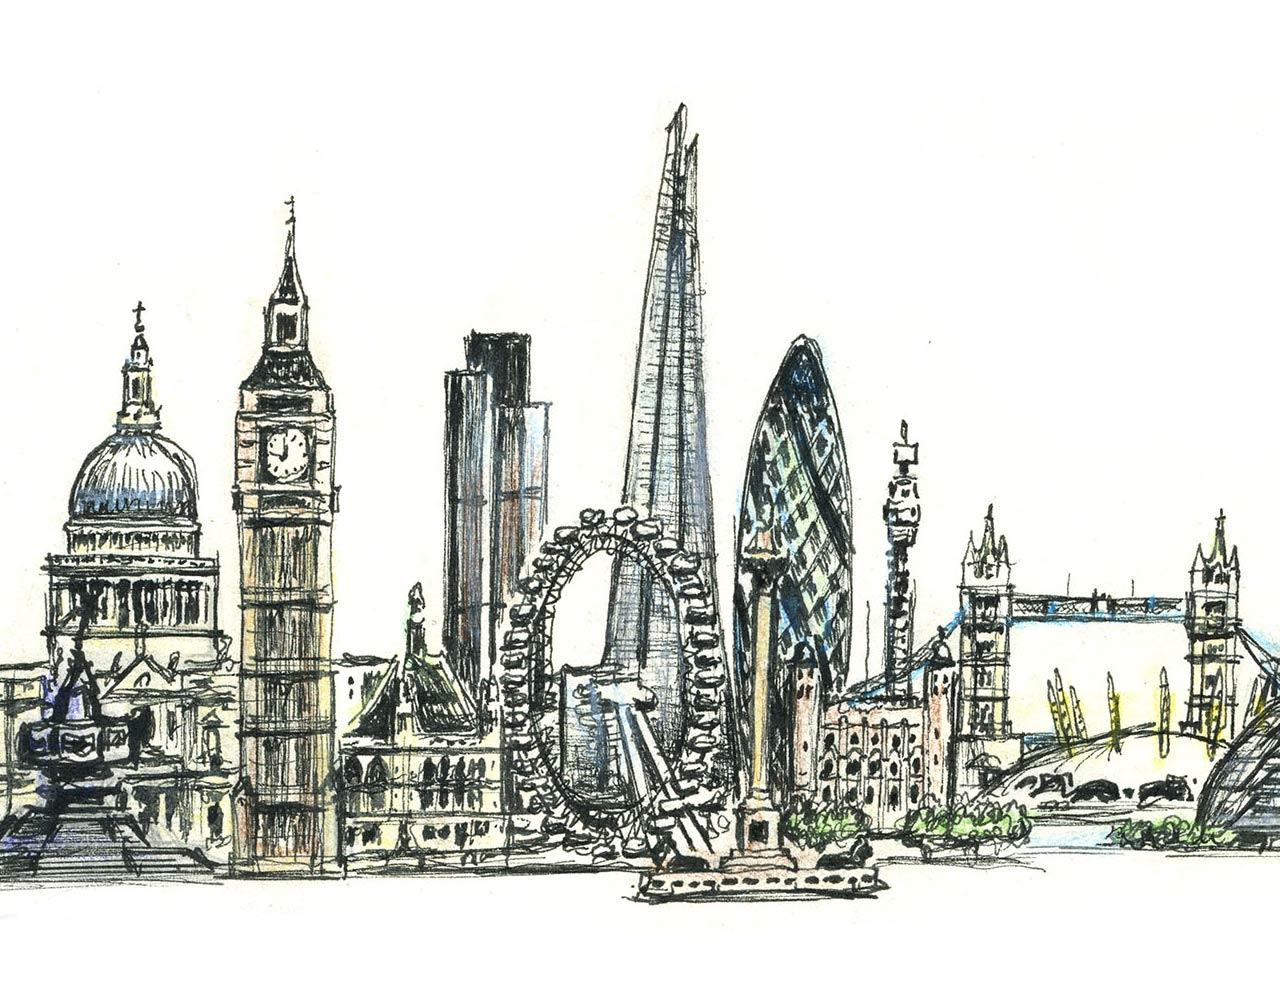 London montage (2 July 2013)